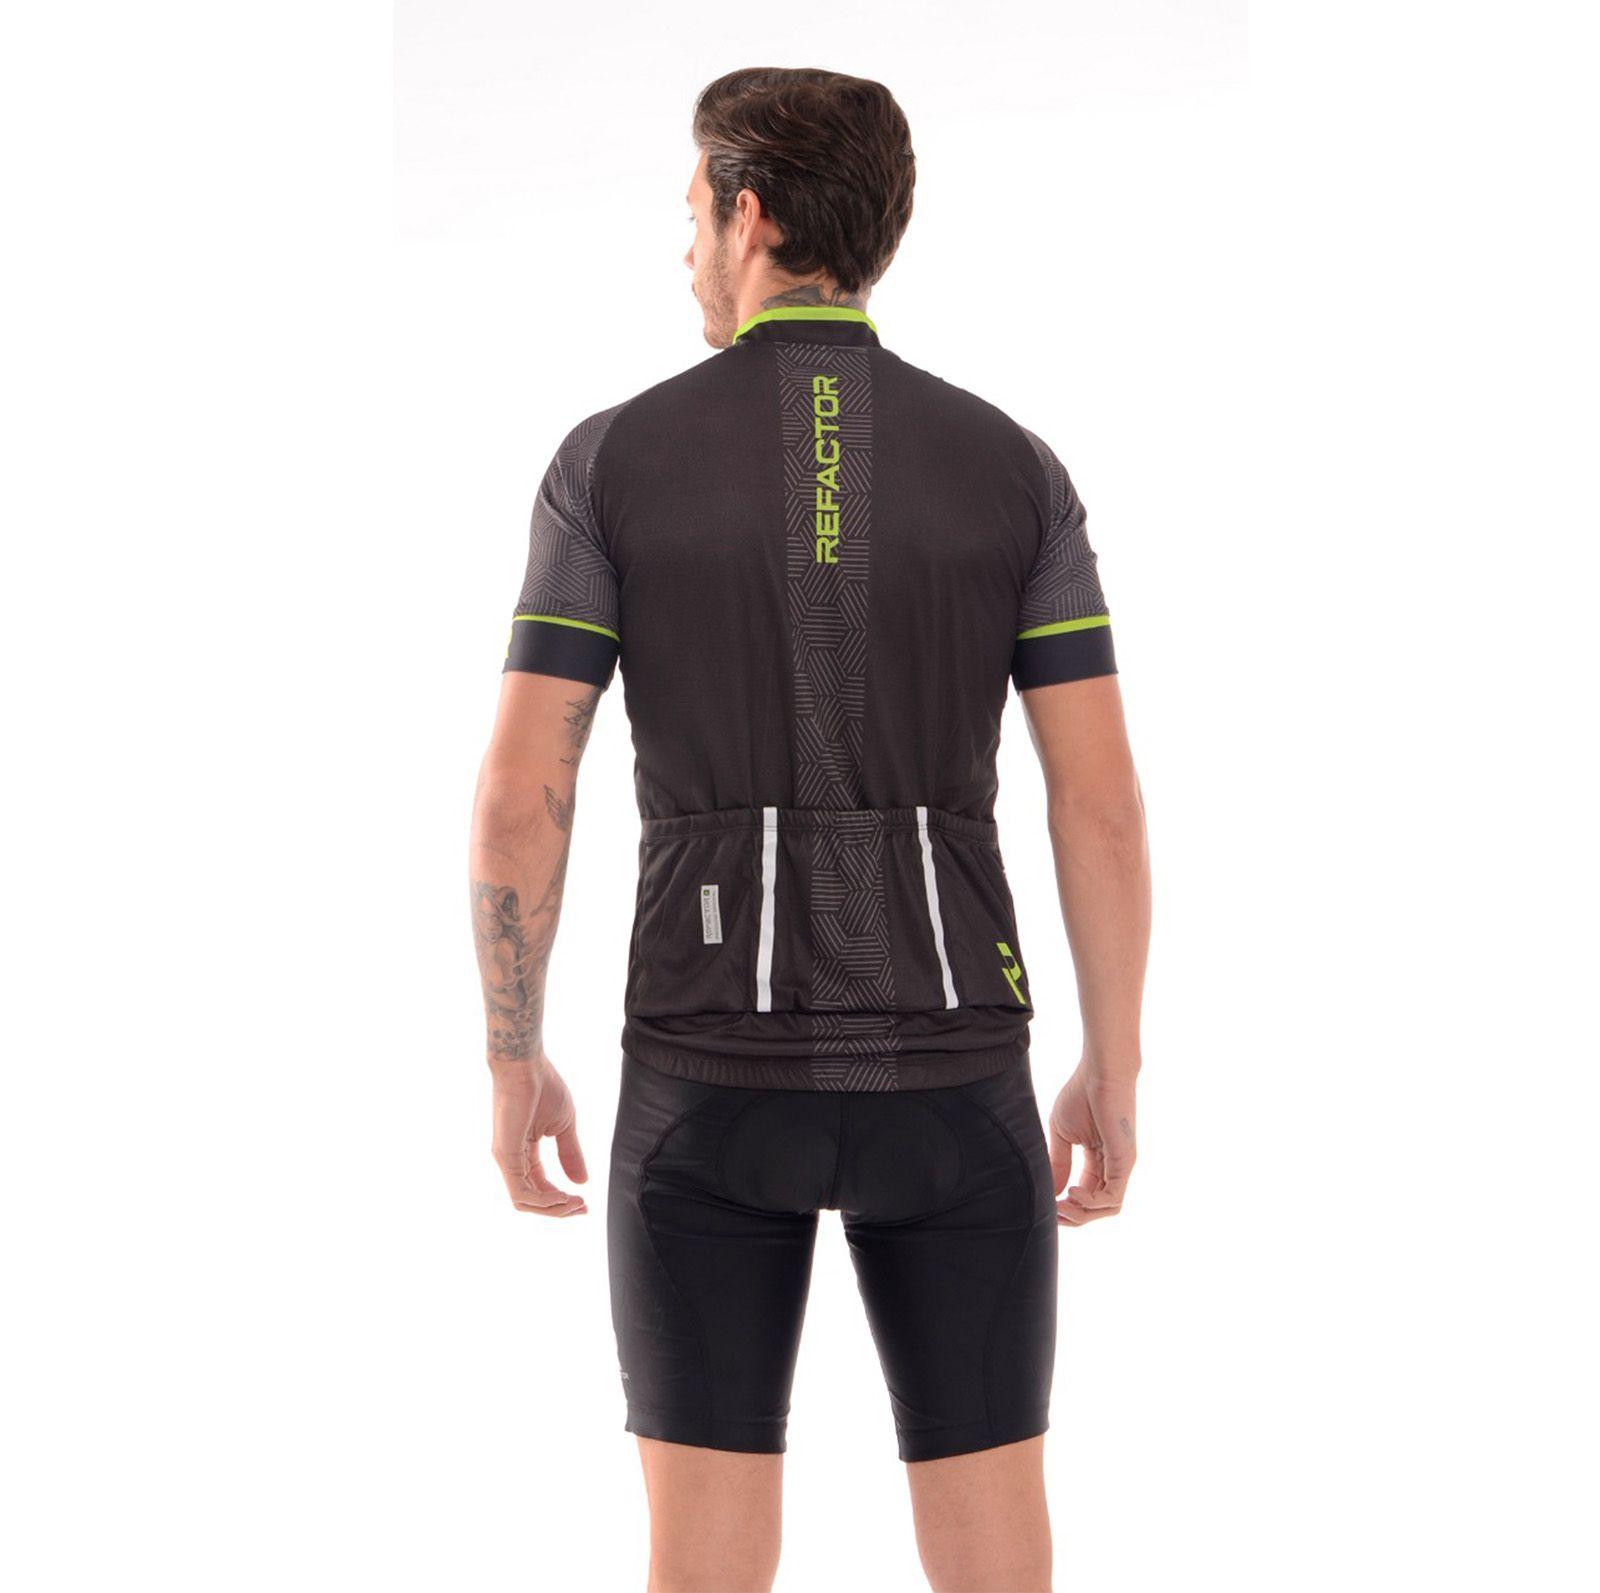 Camisa Ciclismo Masculina Strike Preto/Verde - Refactor